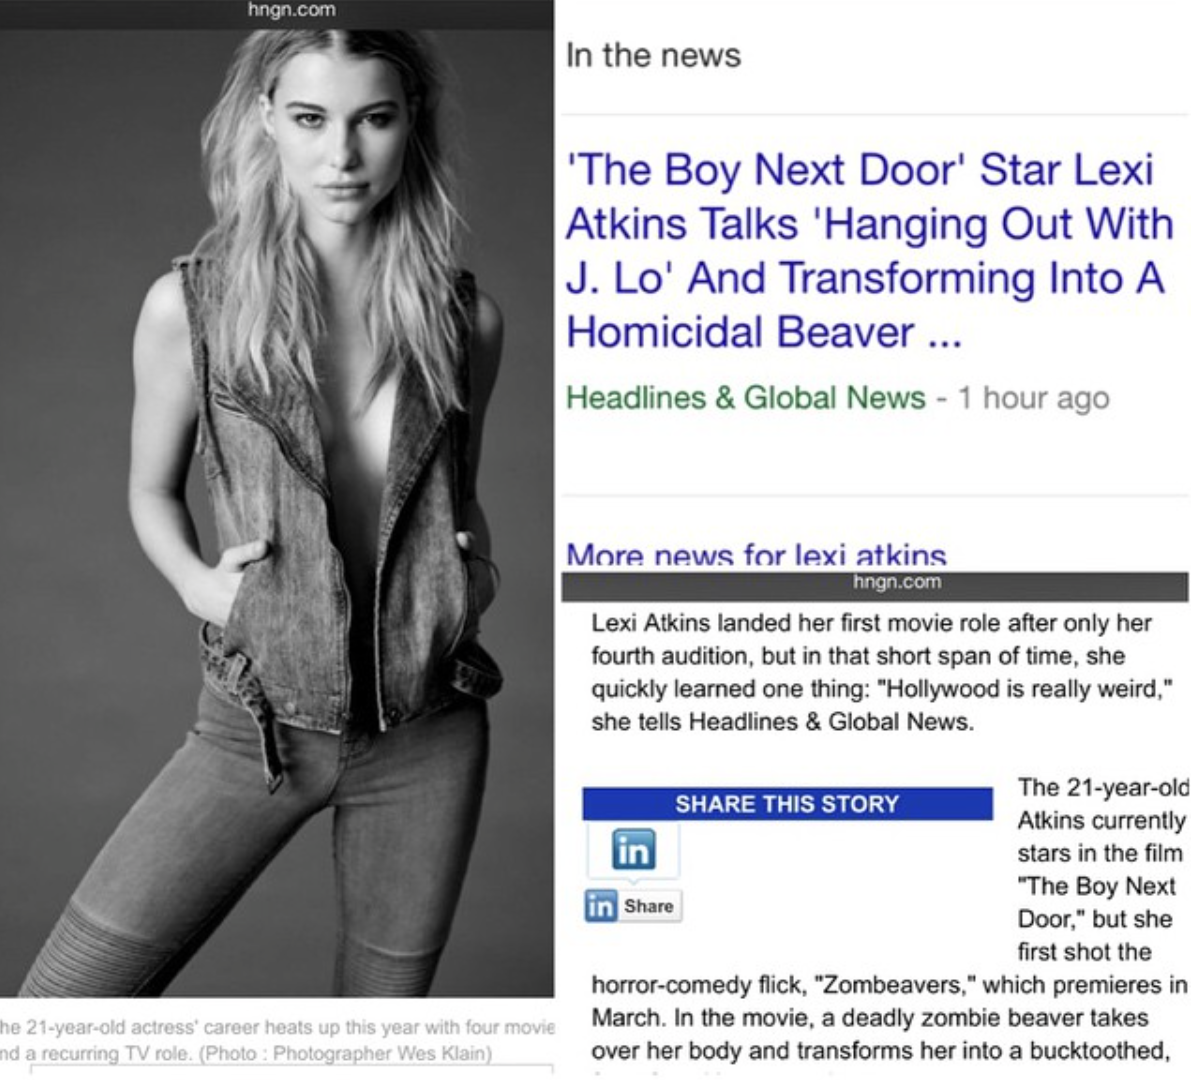 Headlines & Global News